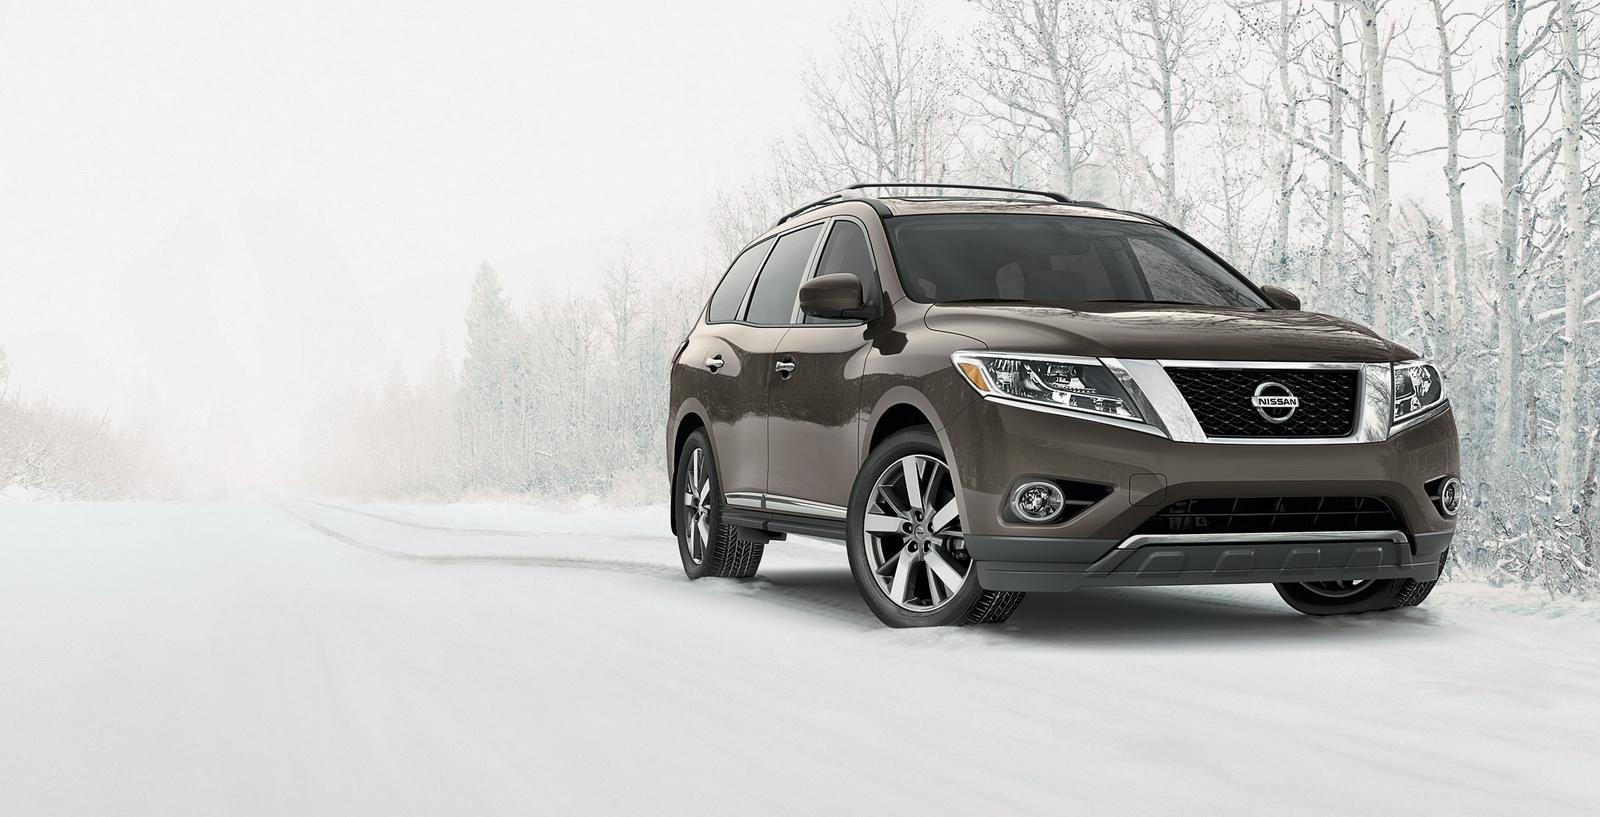 Nissan Pathfinder 2015 có giá từ 30.395 USD